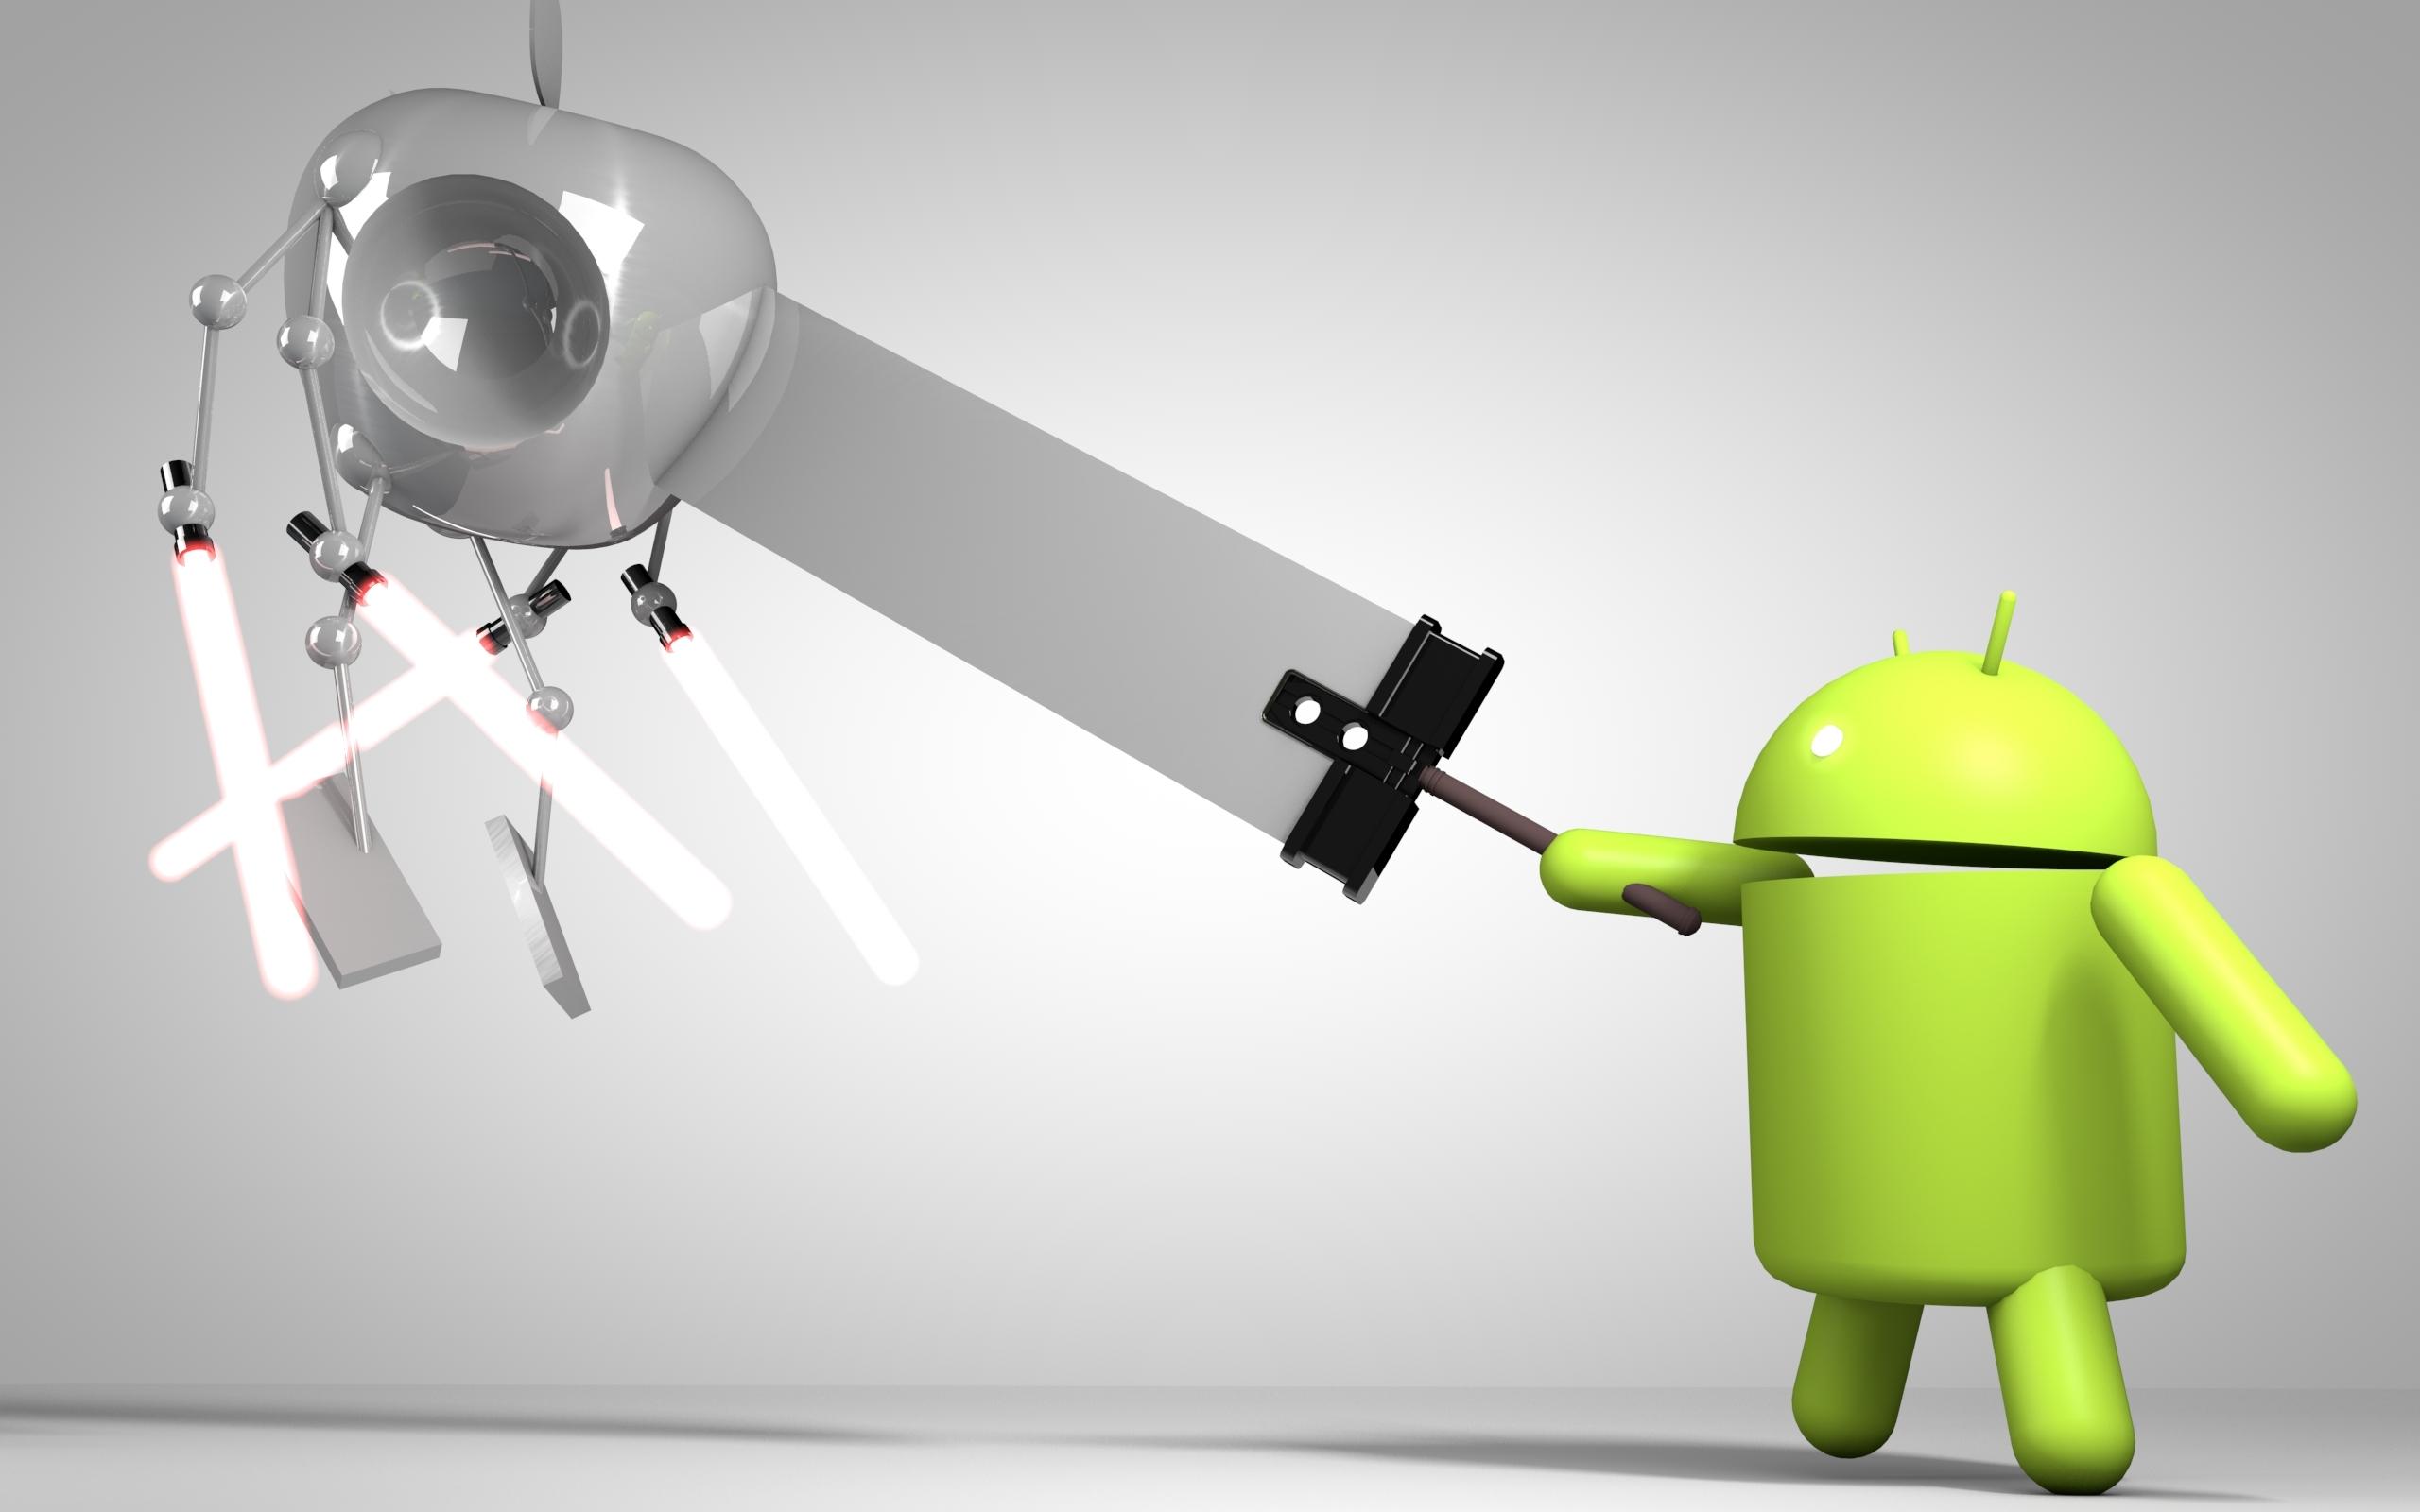 Logos-Wallpaper-Of-Android-VS-Apple